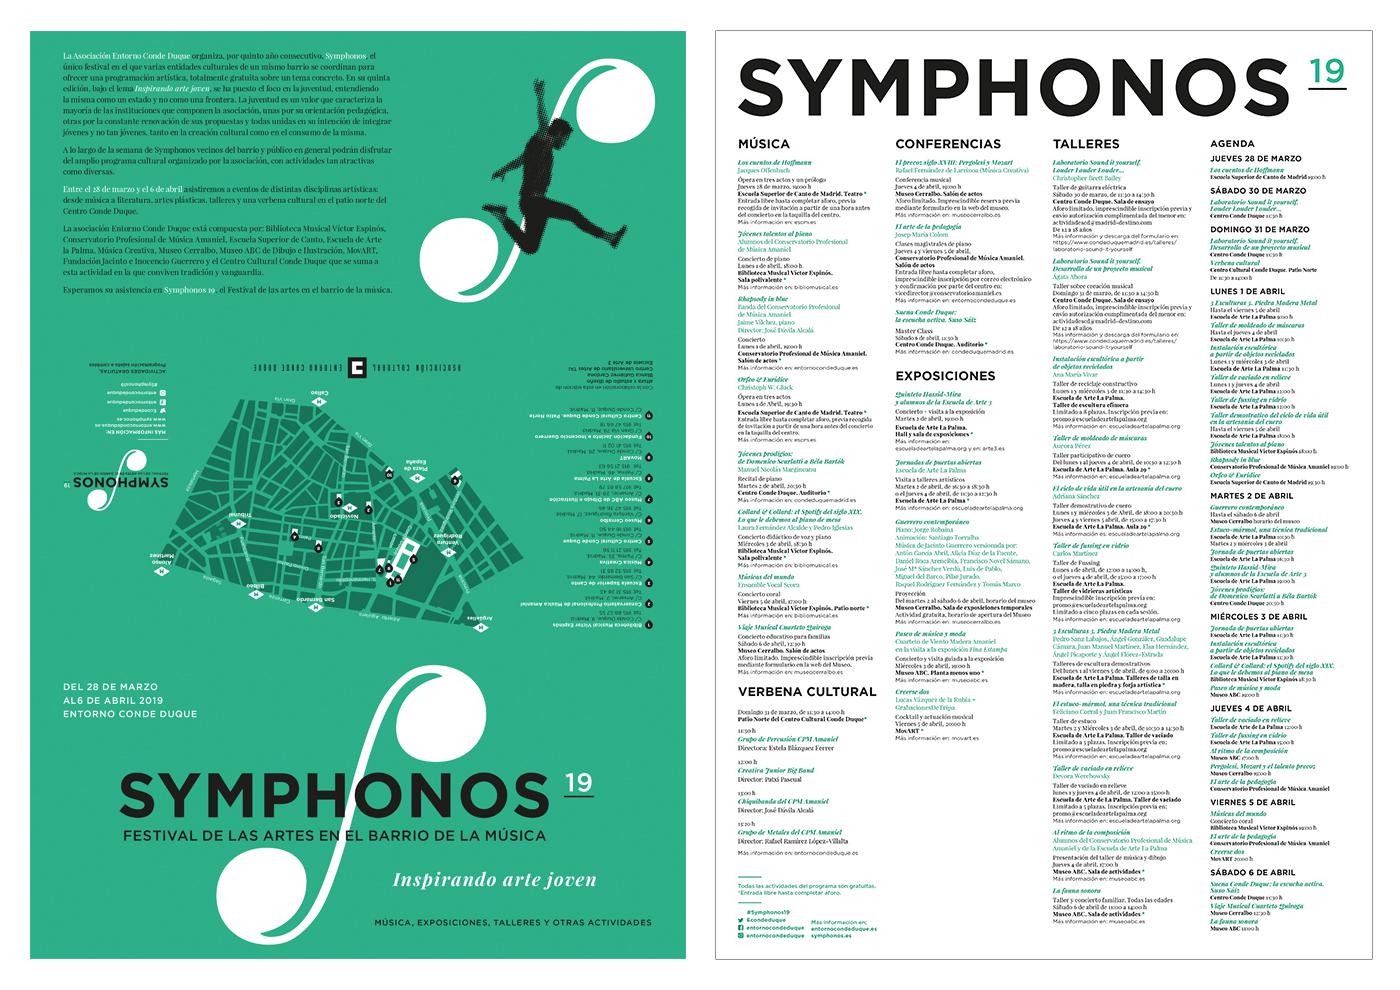 comp_symphonos_19_2.jpg